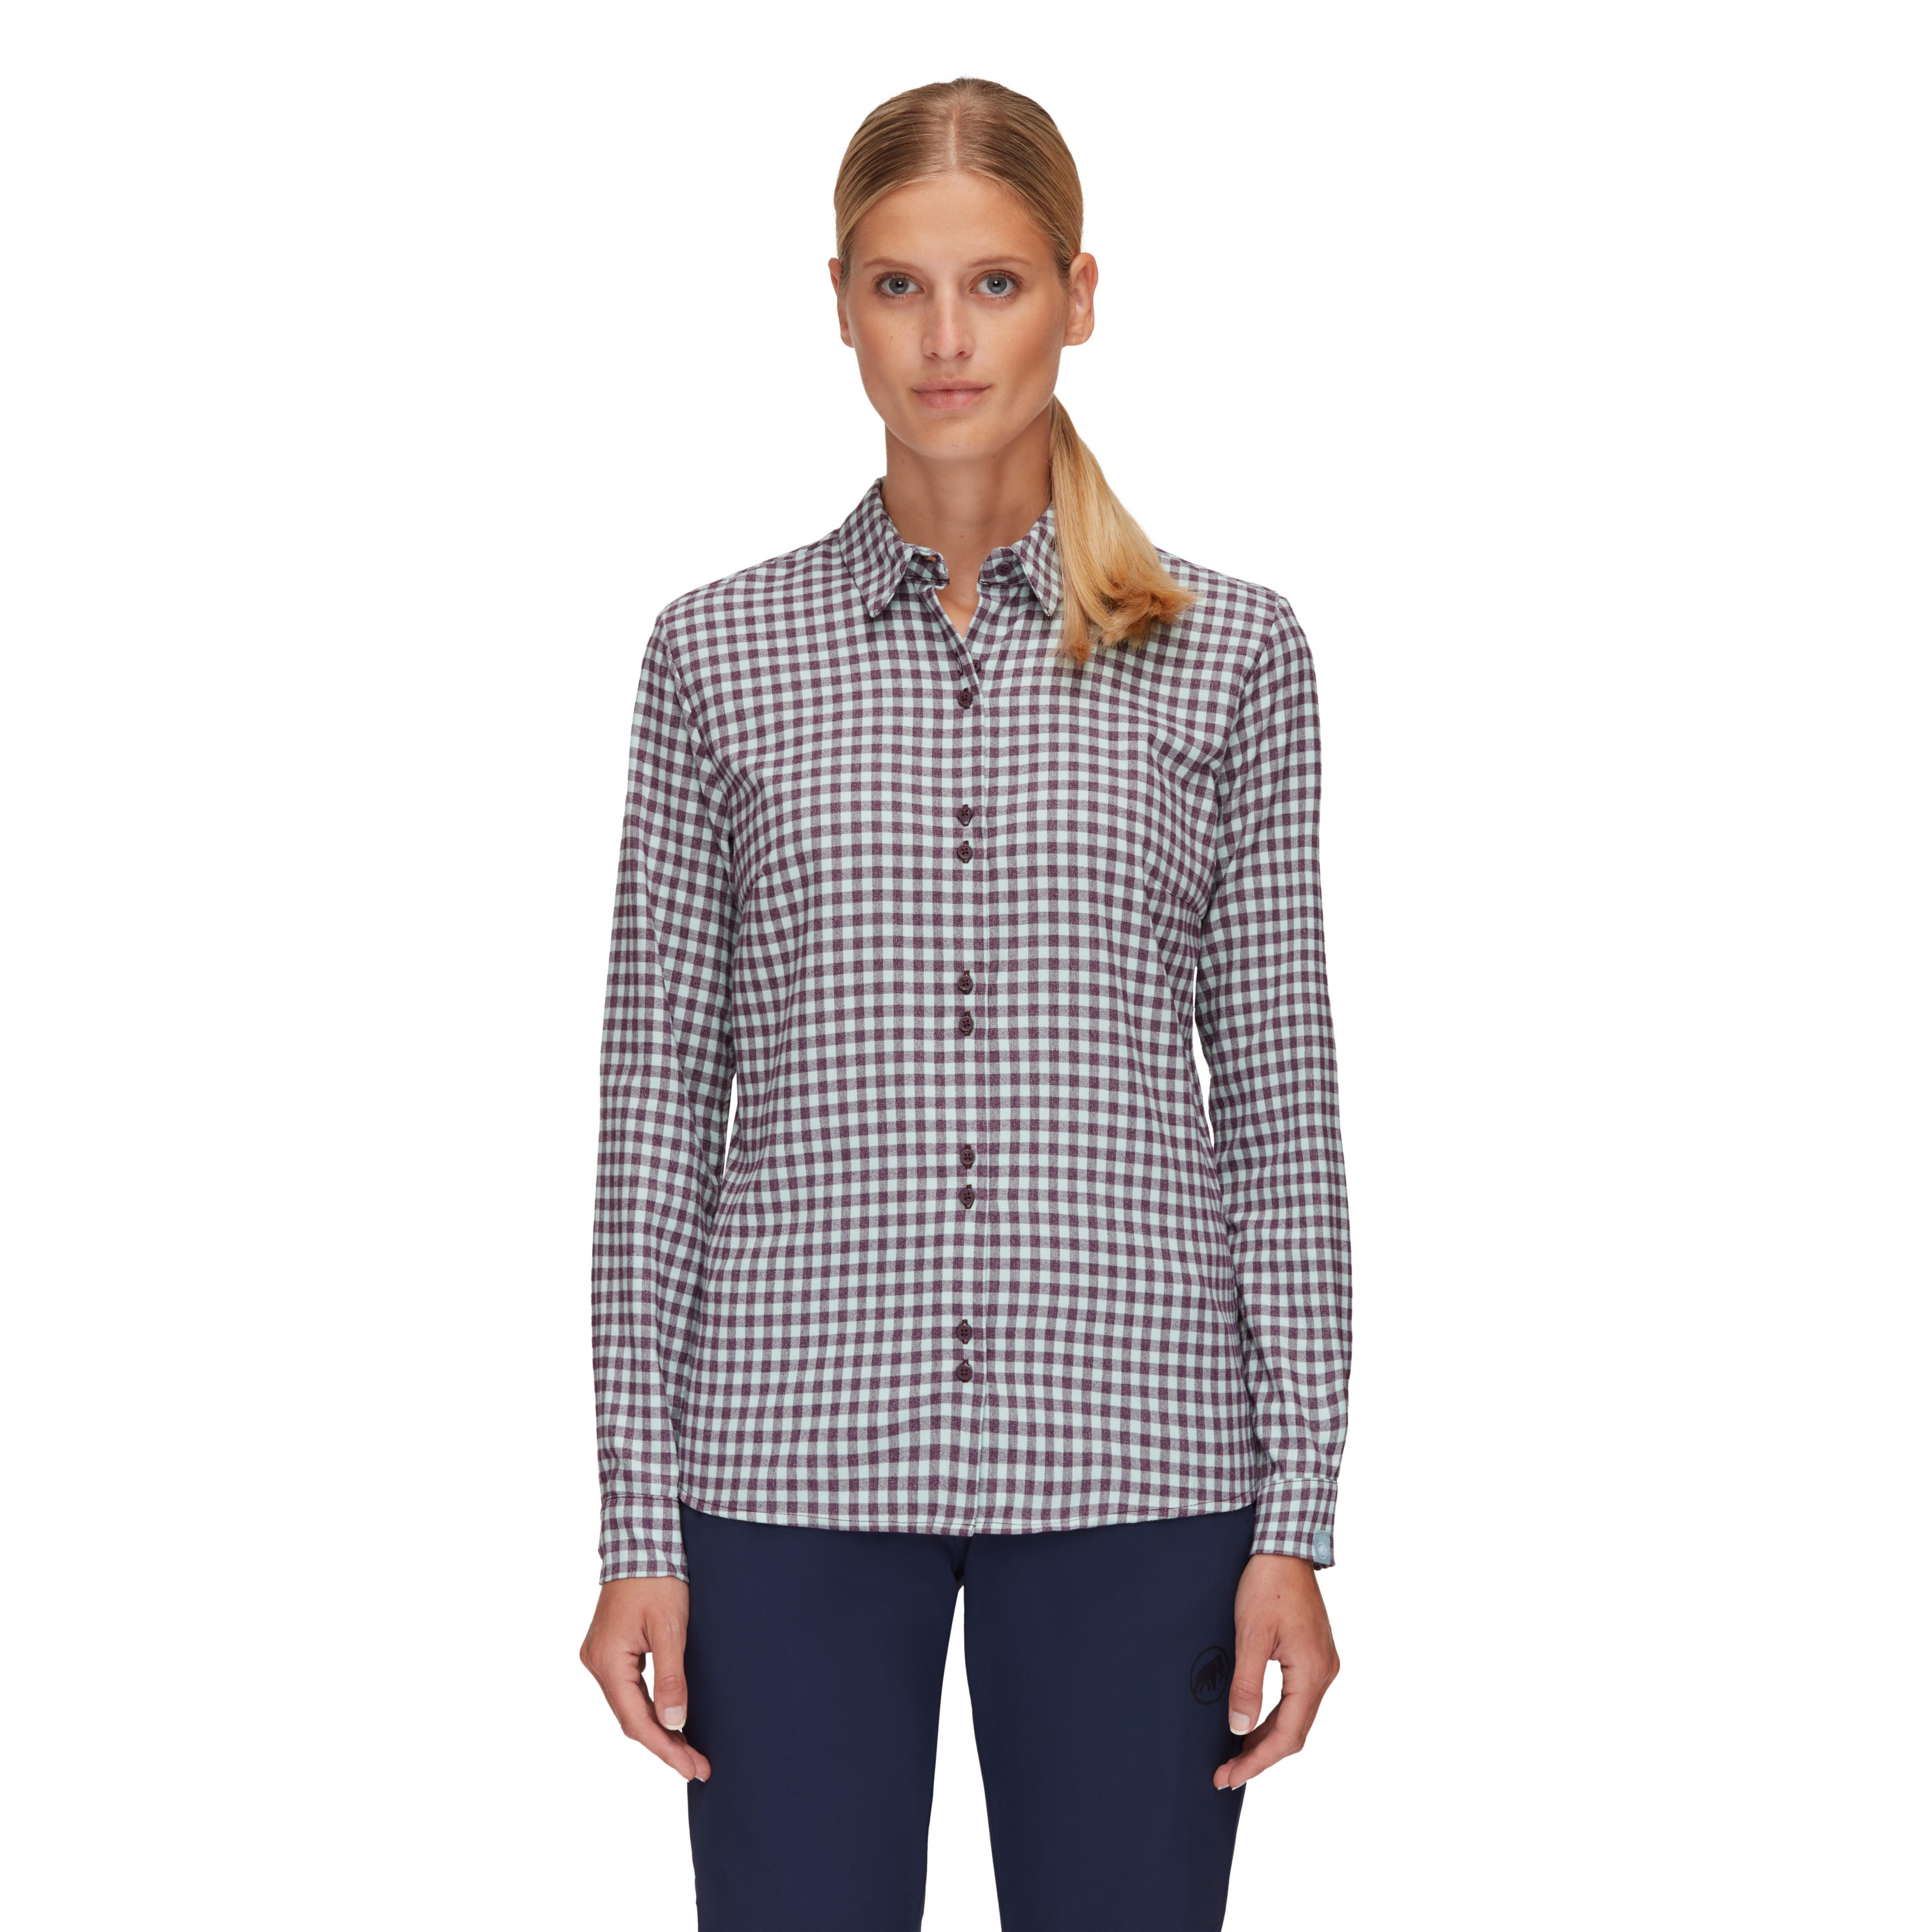 Winter Longsleeve Shirt Women product image